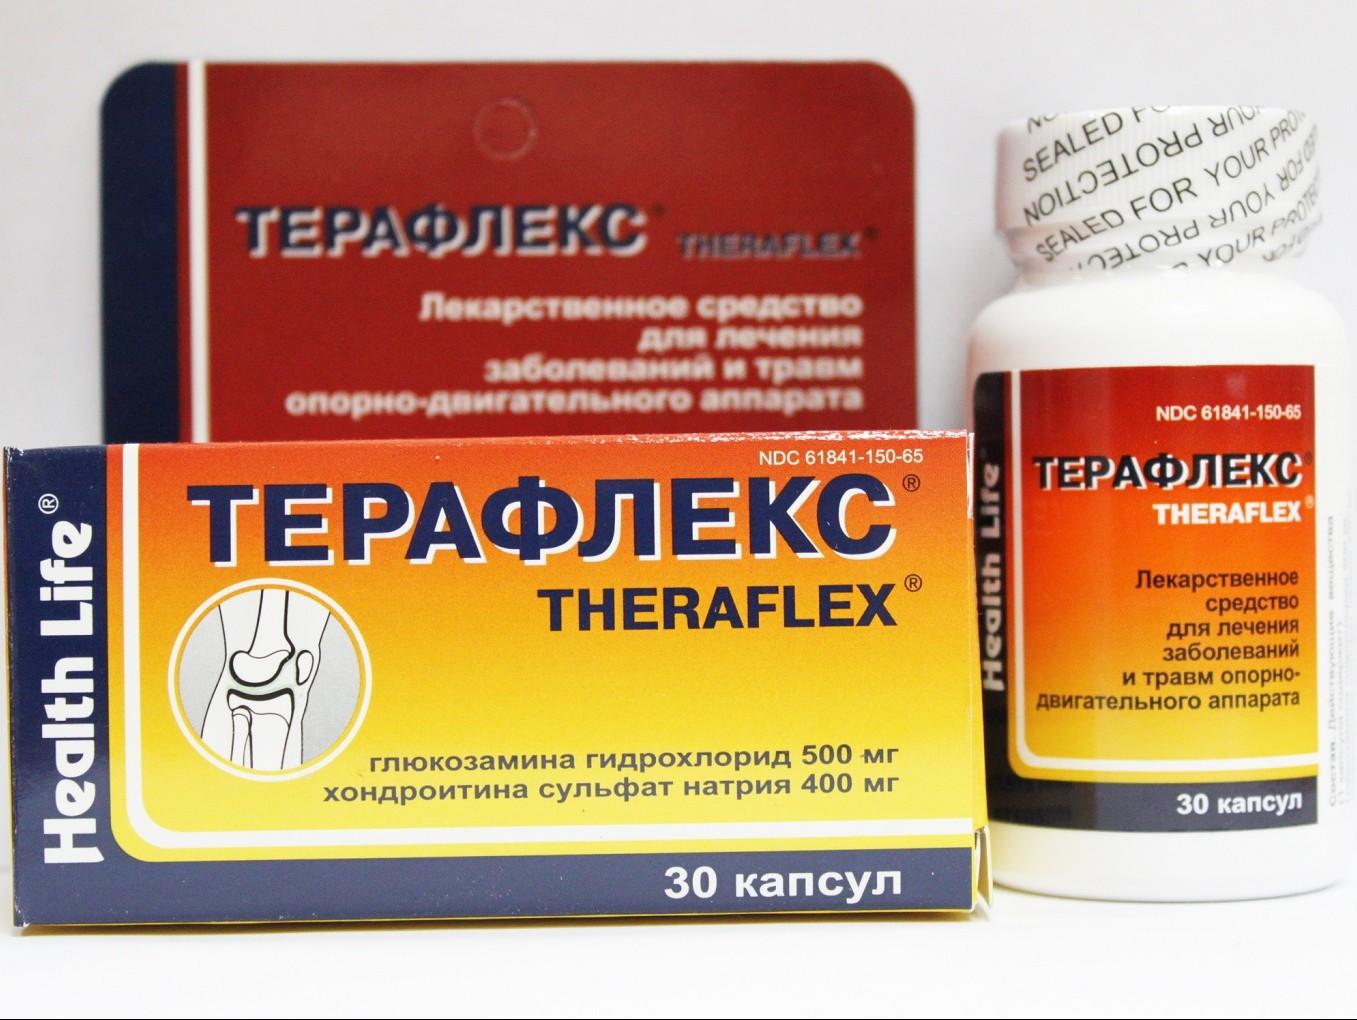 лекарство для лечения от паразитов